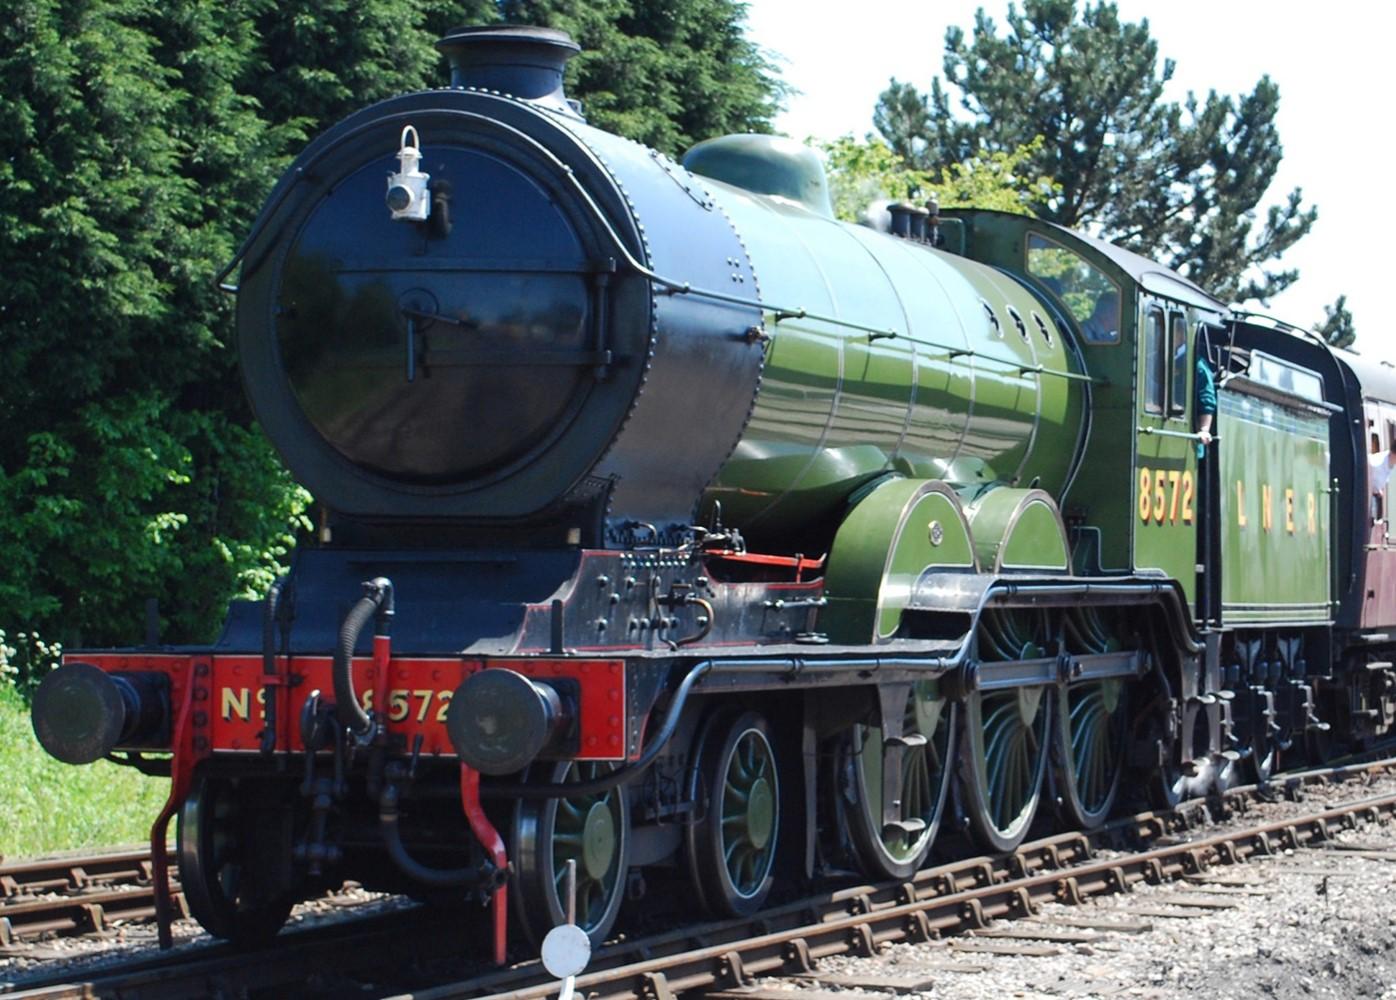 8572 at Toddington in June 2013 © Hugh Llewelyn